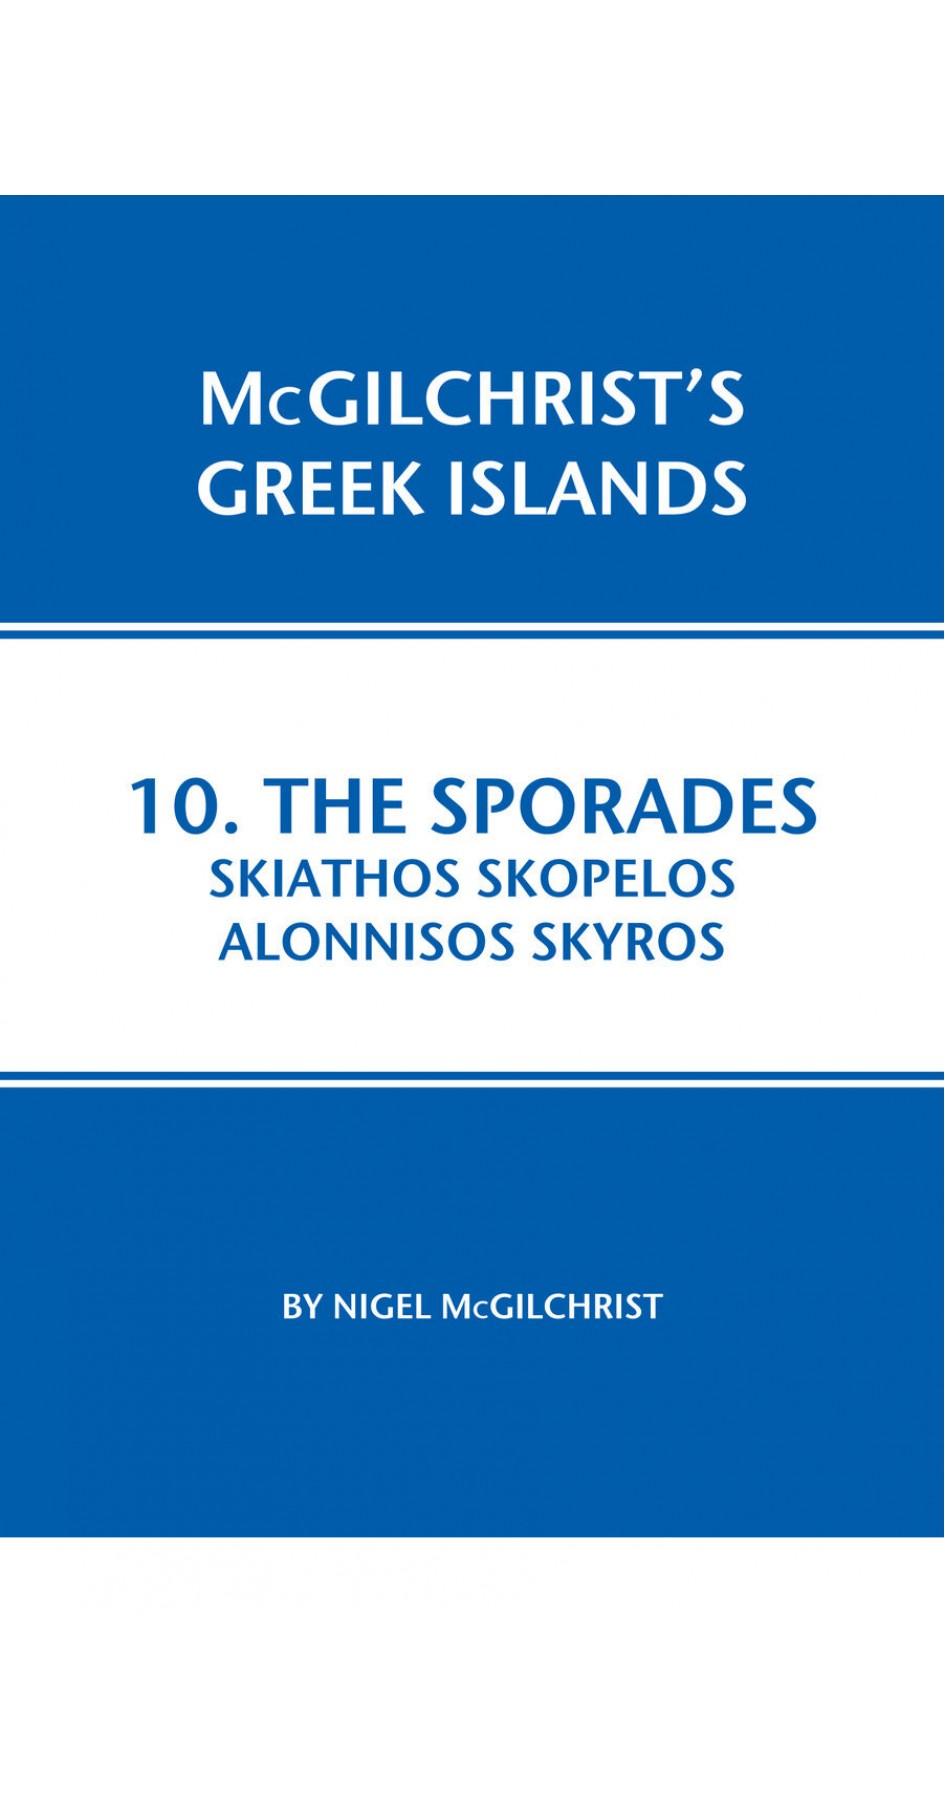 10. The Sporades: Skiathos, Skopelos, Alonnisos, Skyros - McGilchrist's Greek Islands